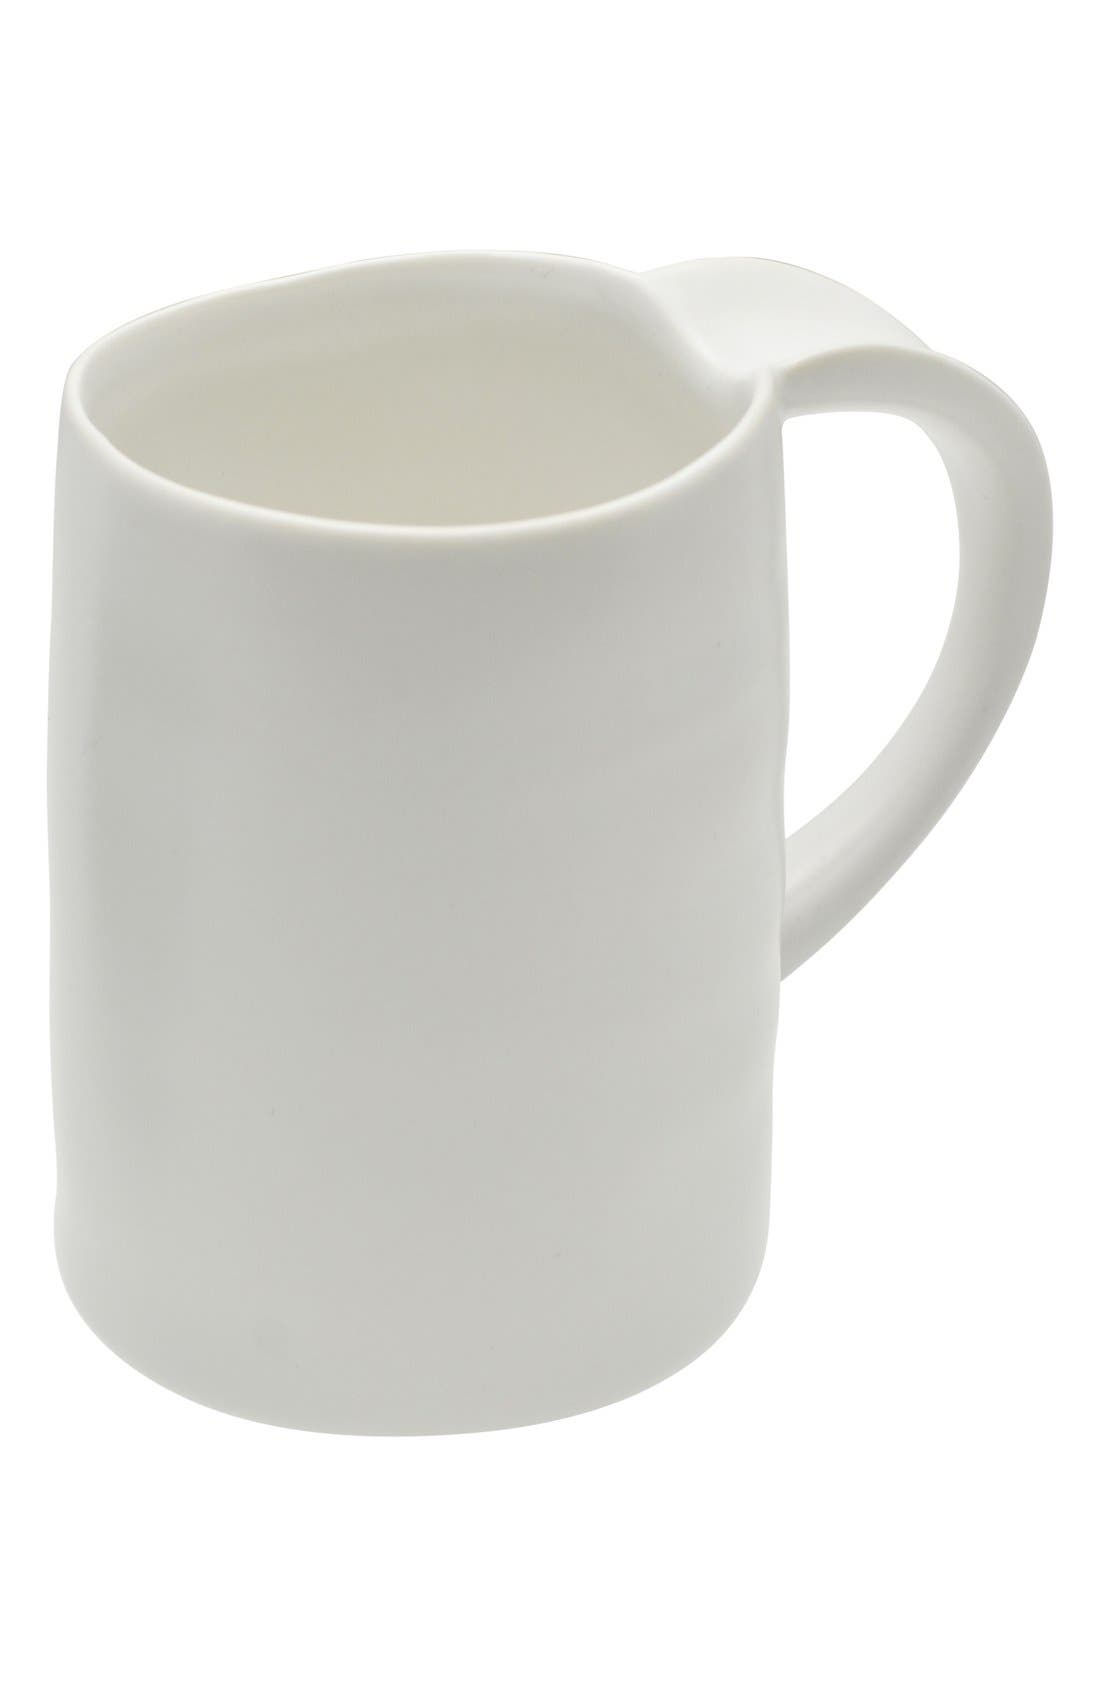 10 Strawberry Street 'Ripple' Porcelain Mugs (Set of 6)